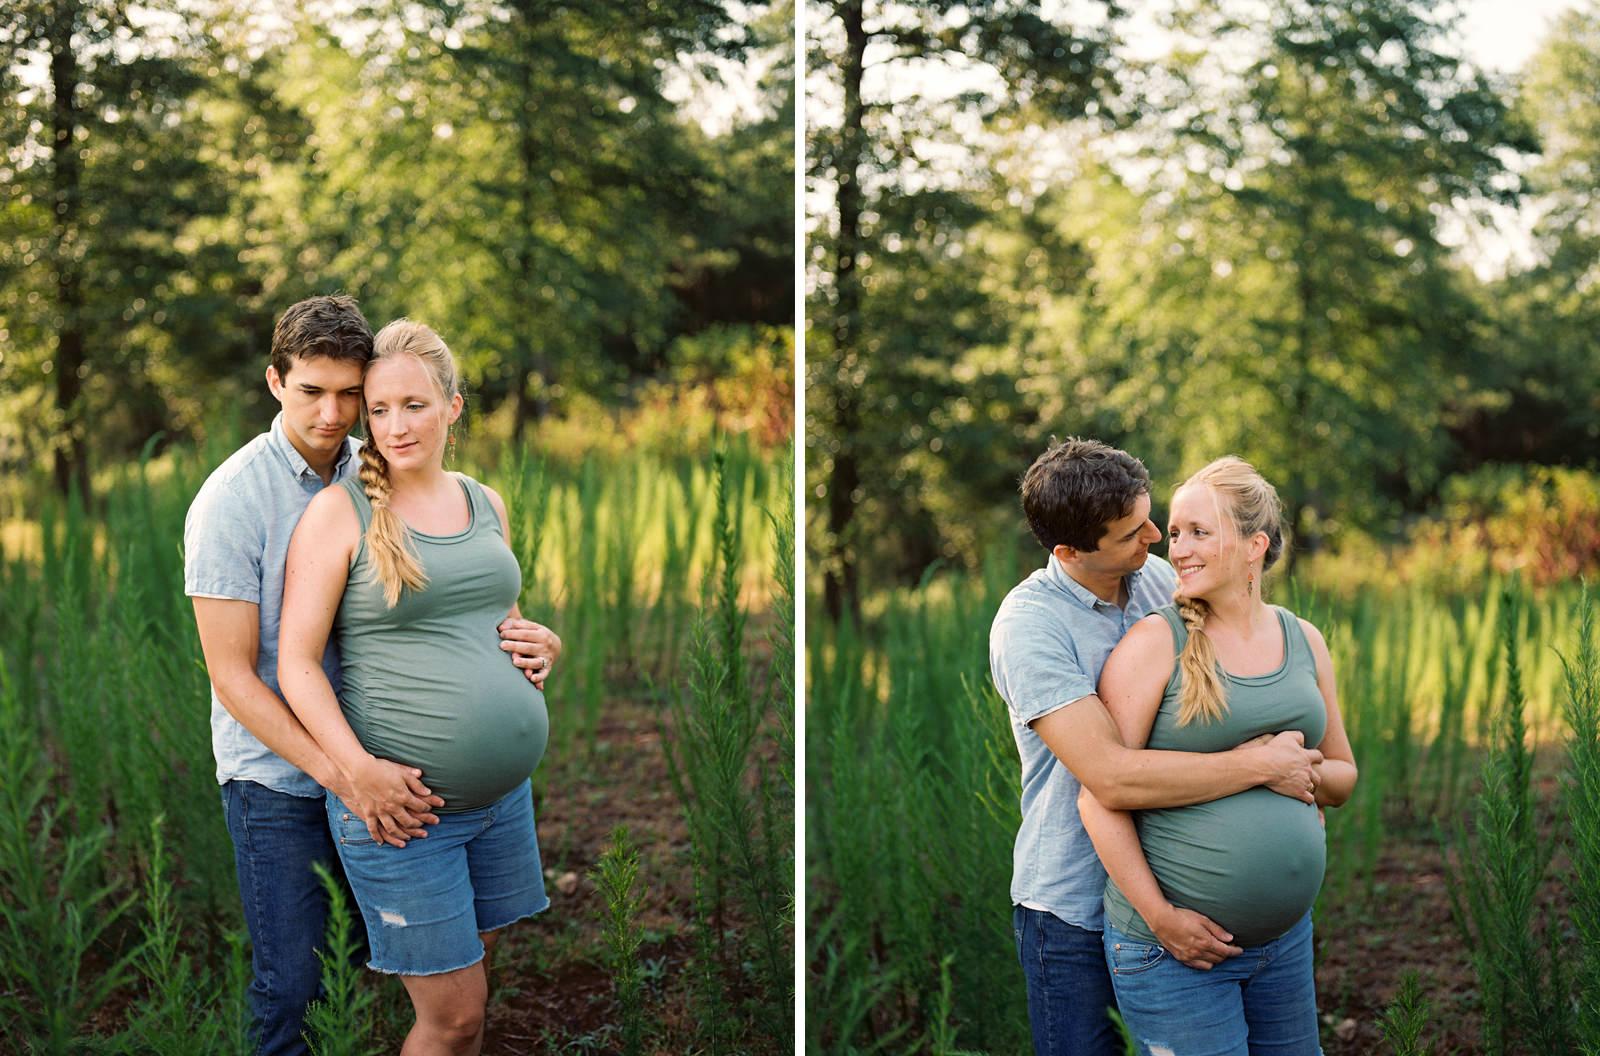 011-maternity-fine-art-film-lifestyle-photography.jpg